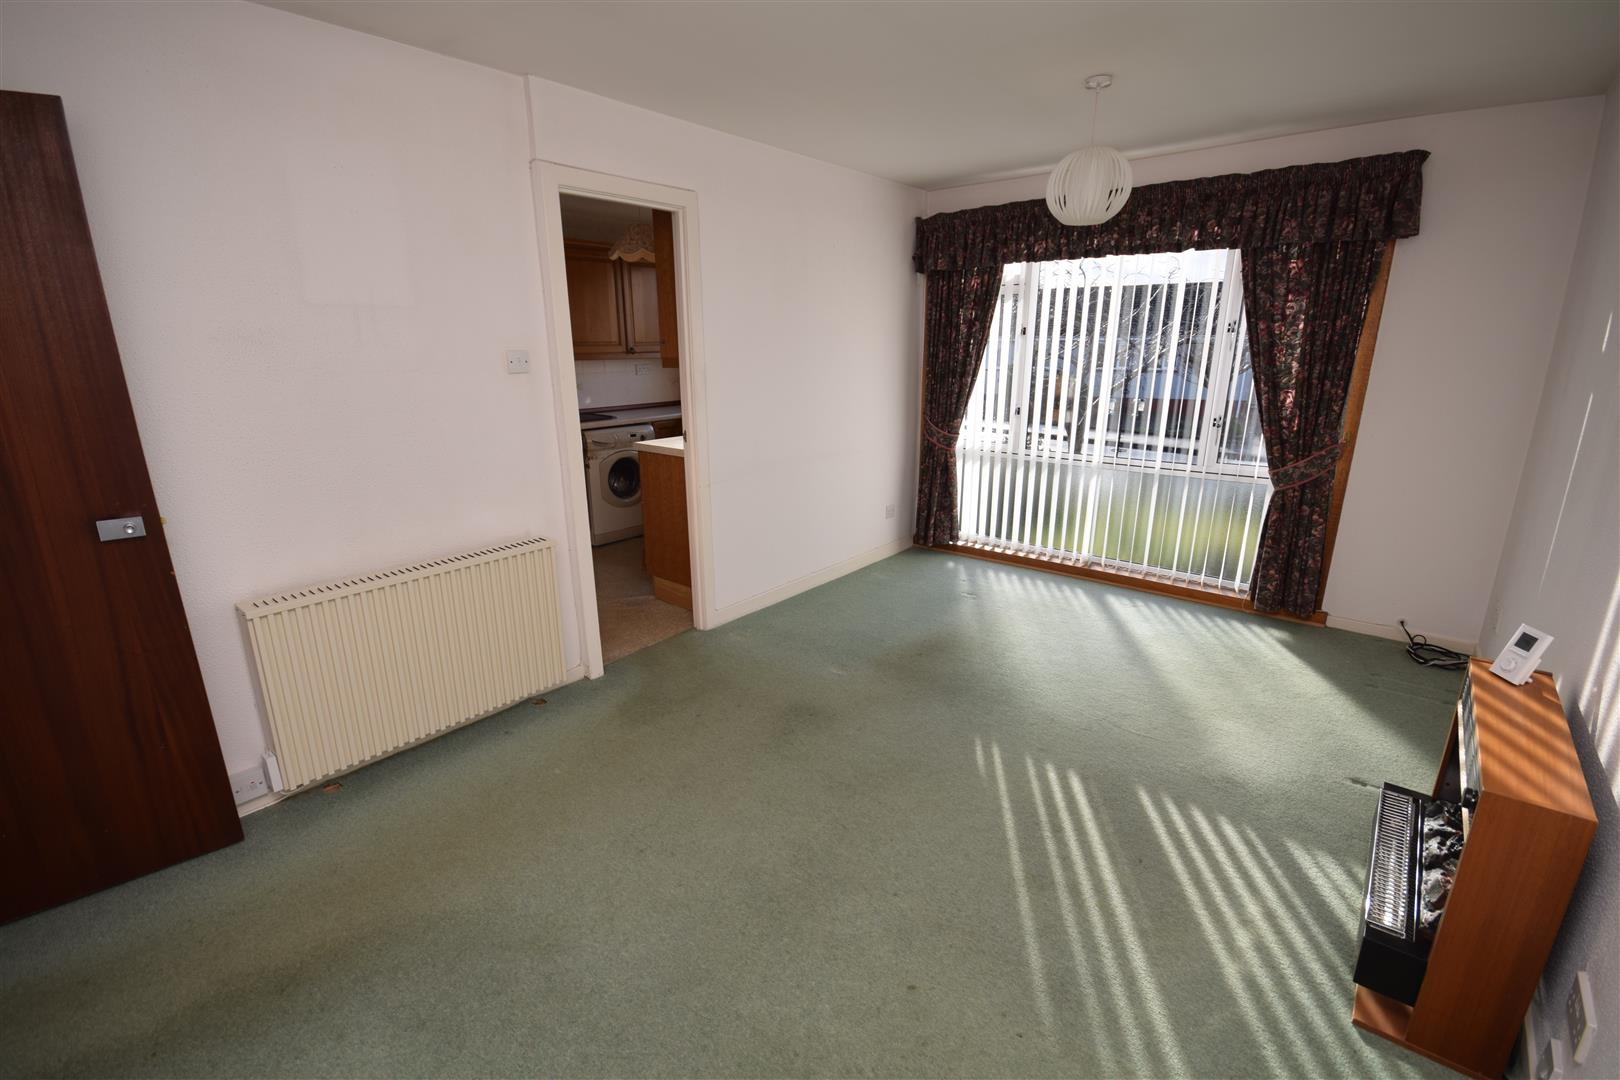 24, Cedar Place, Perth, Perthshire, PH1 1RL, UK